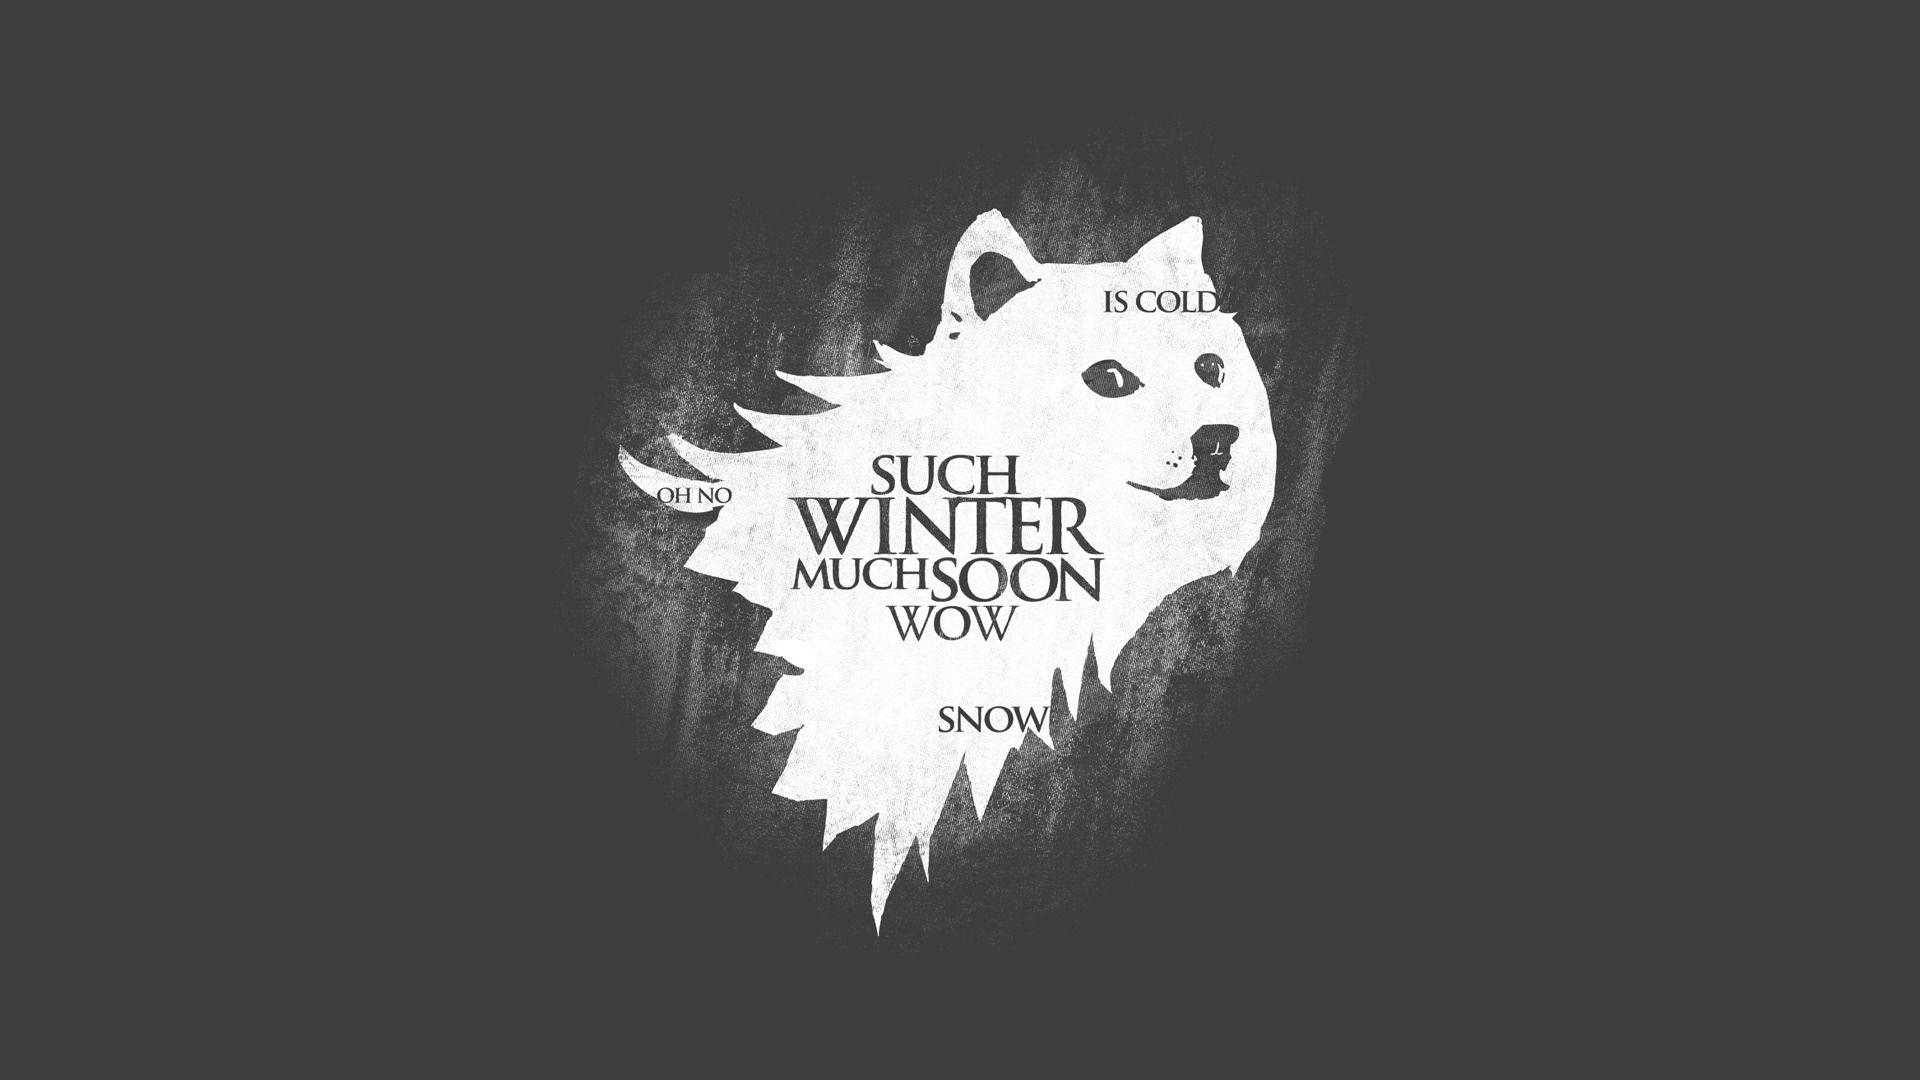 Game of Thrones House Stark Minimalist such winter wow dog